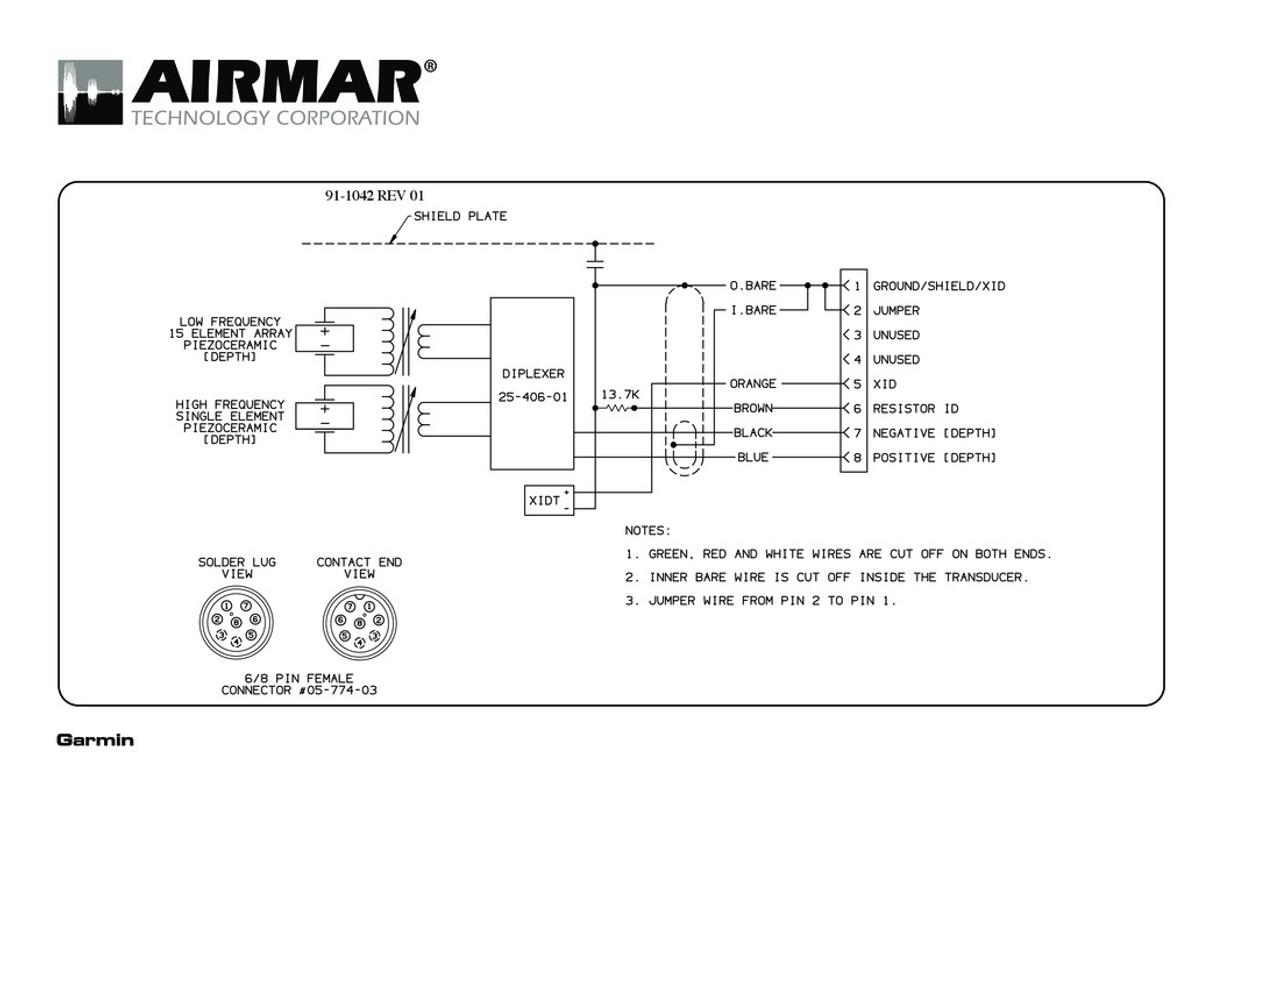 medium resolution of airmar wiring diagram garmin r199 8 pin d t blue bottle marinedepth only